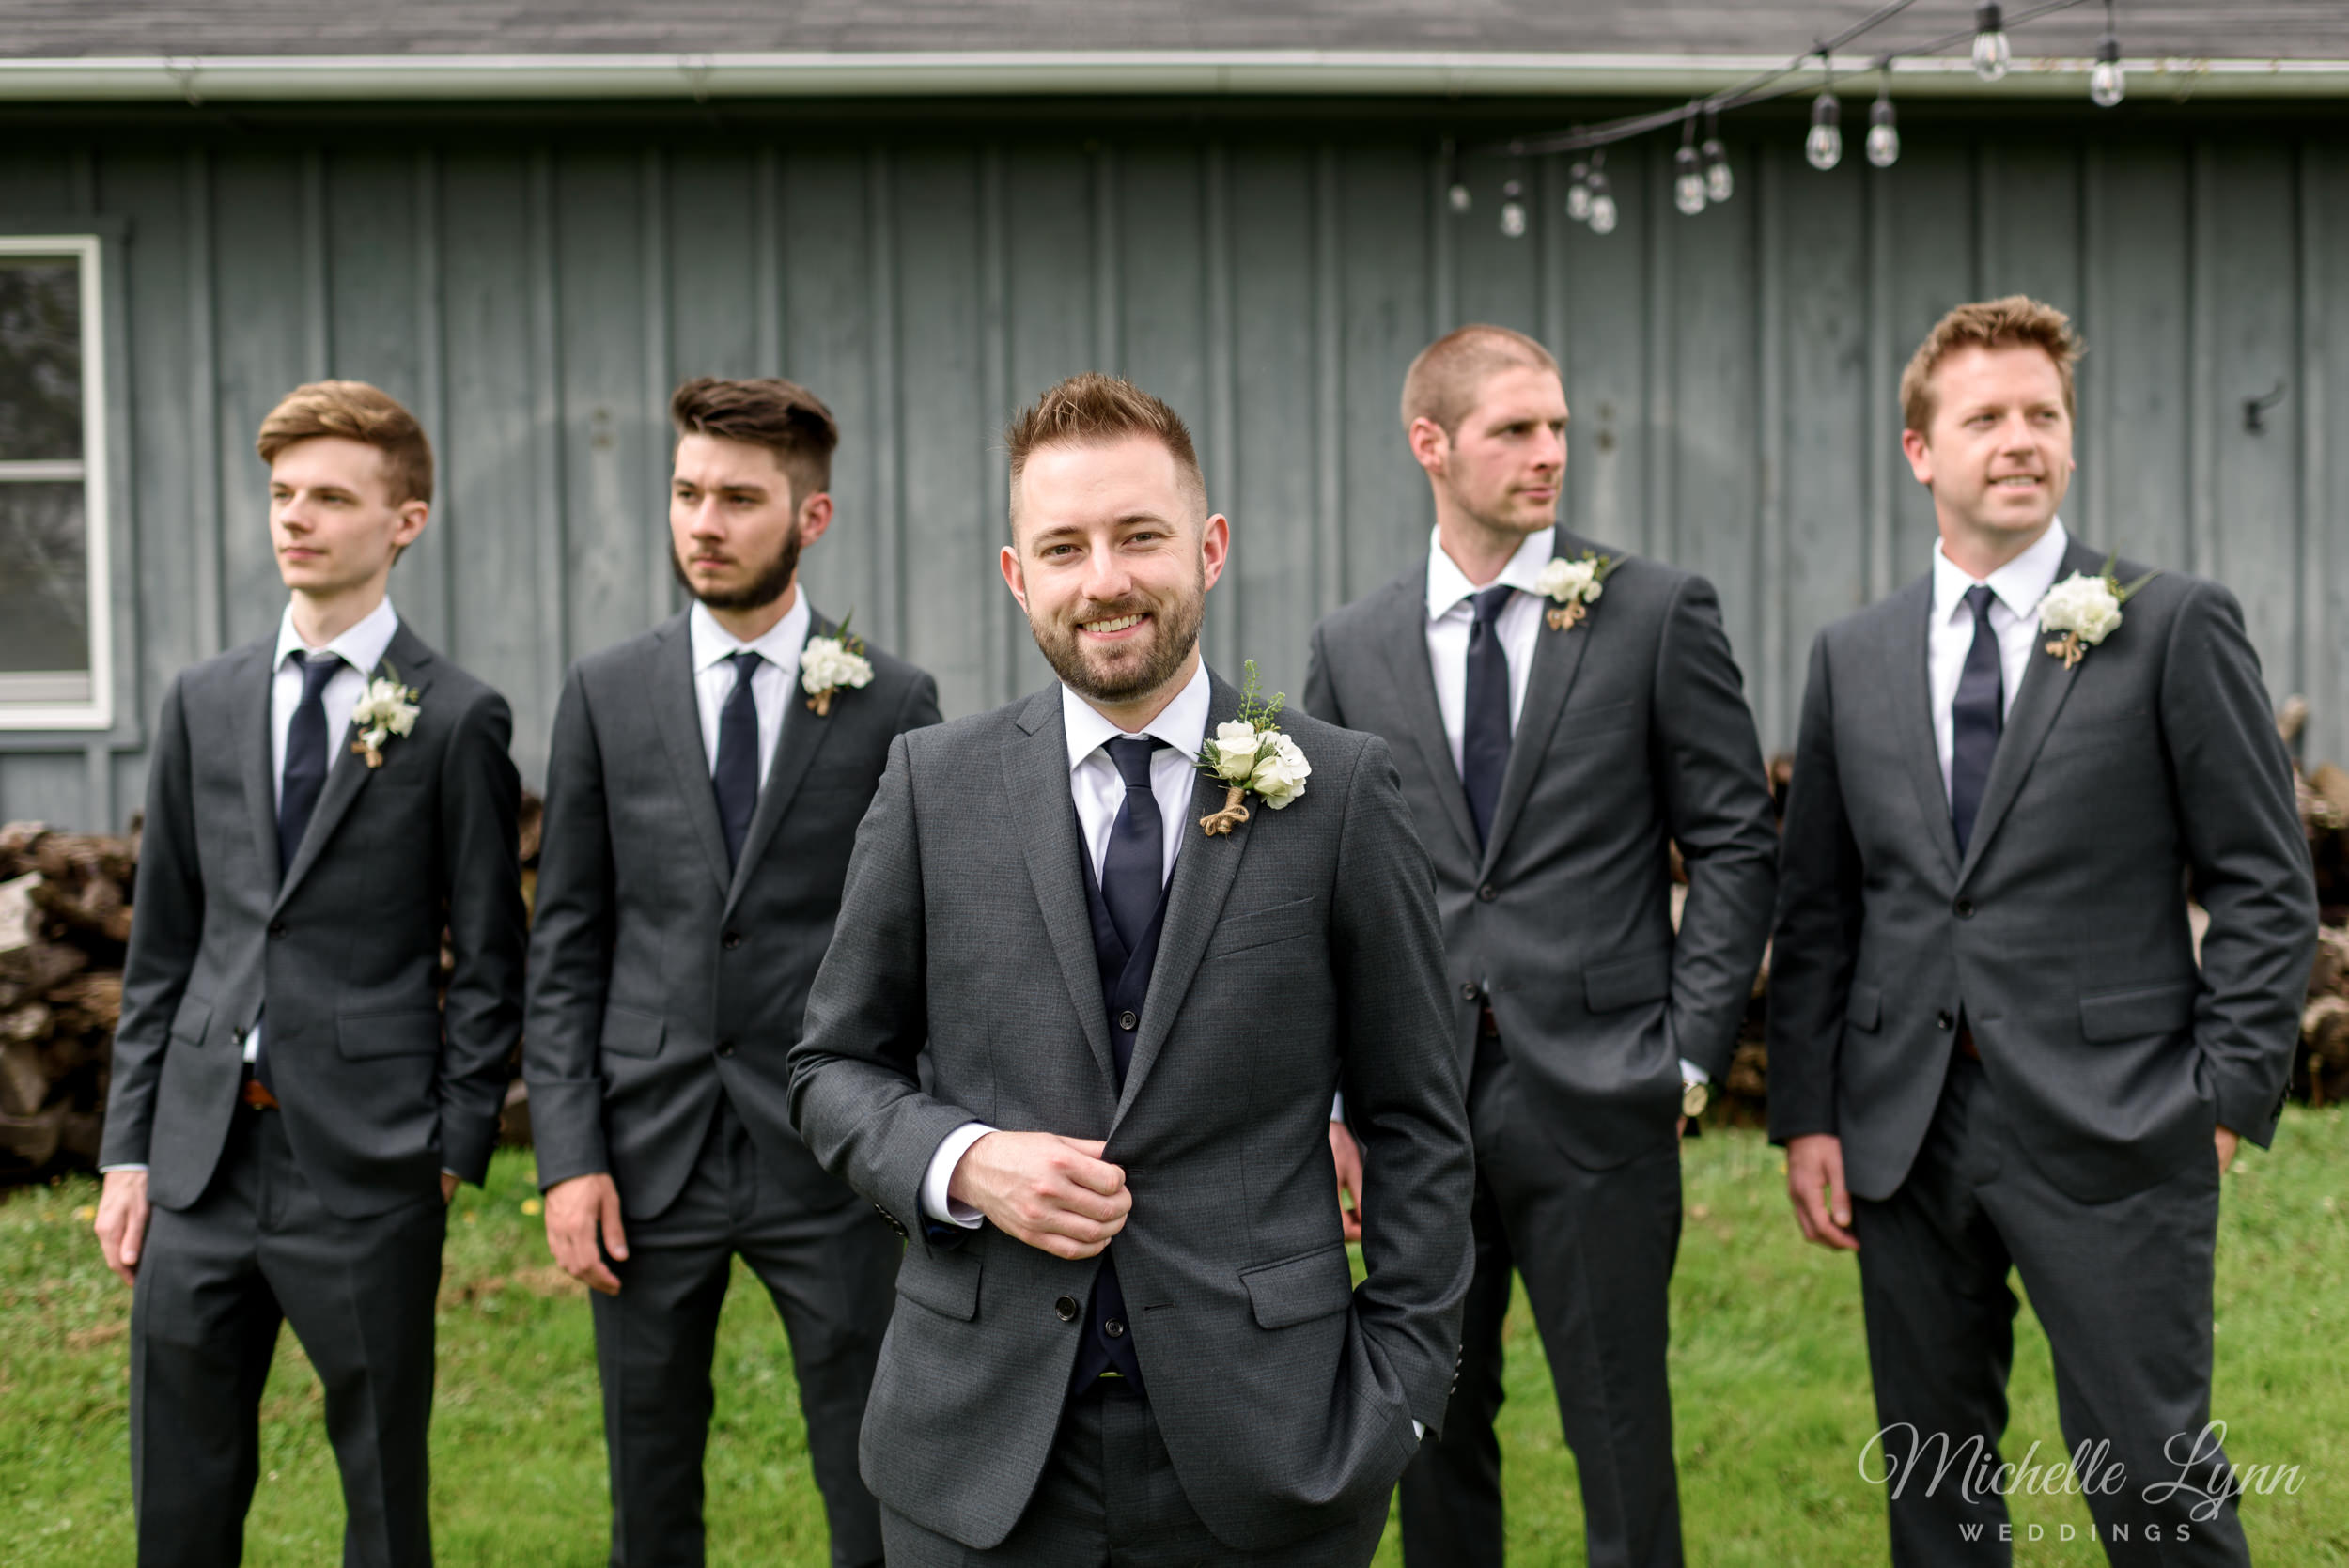 mlw-the-farm-bakery-and-events-wedding-photos-26.jpg